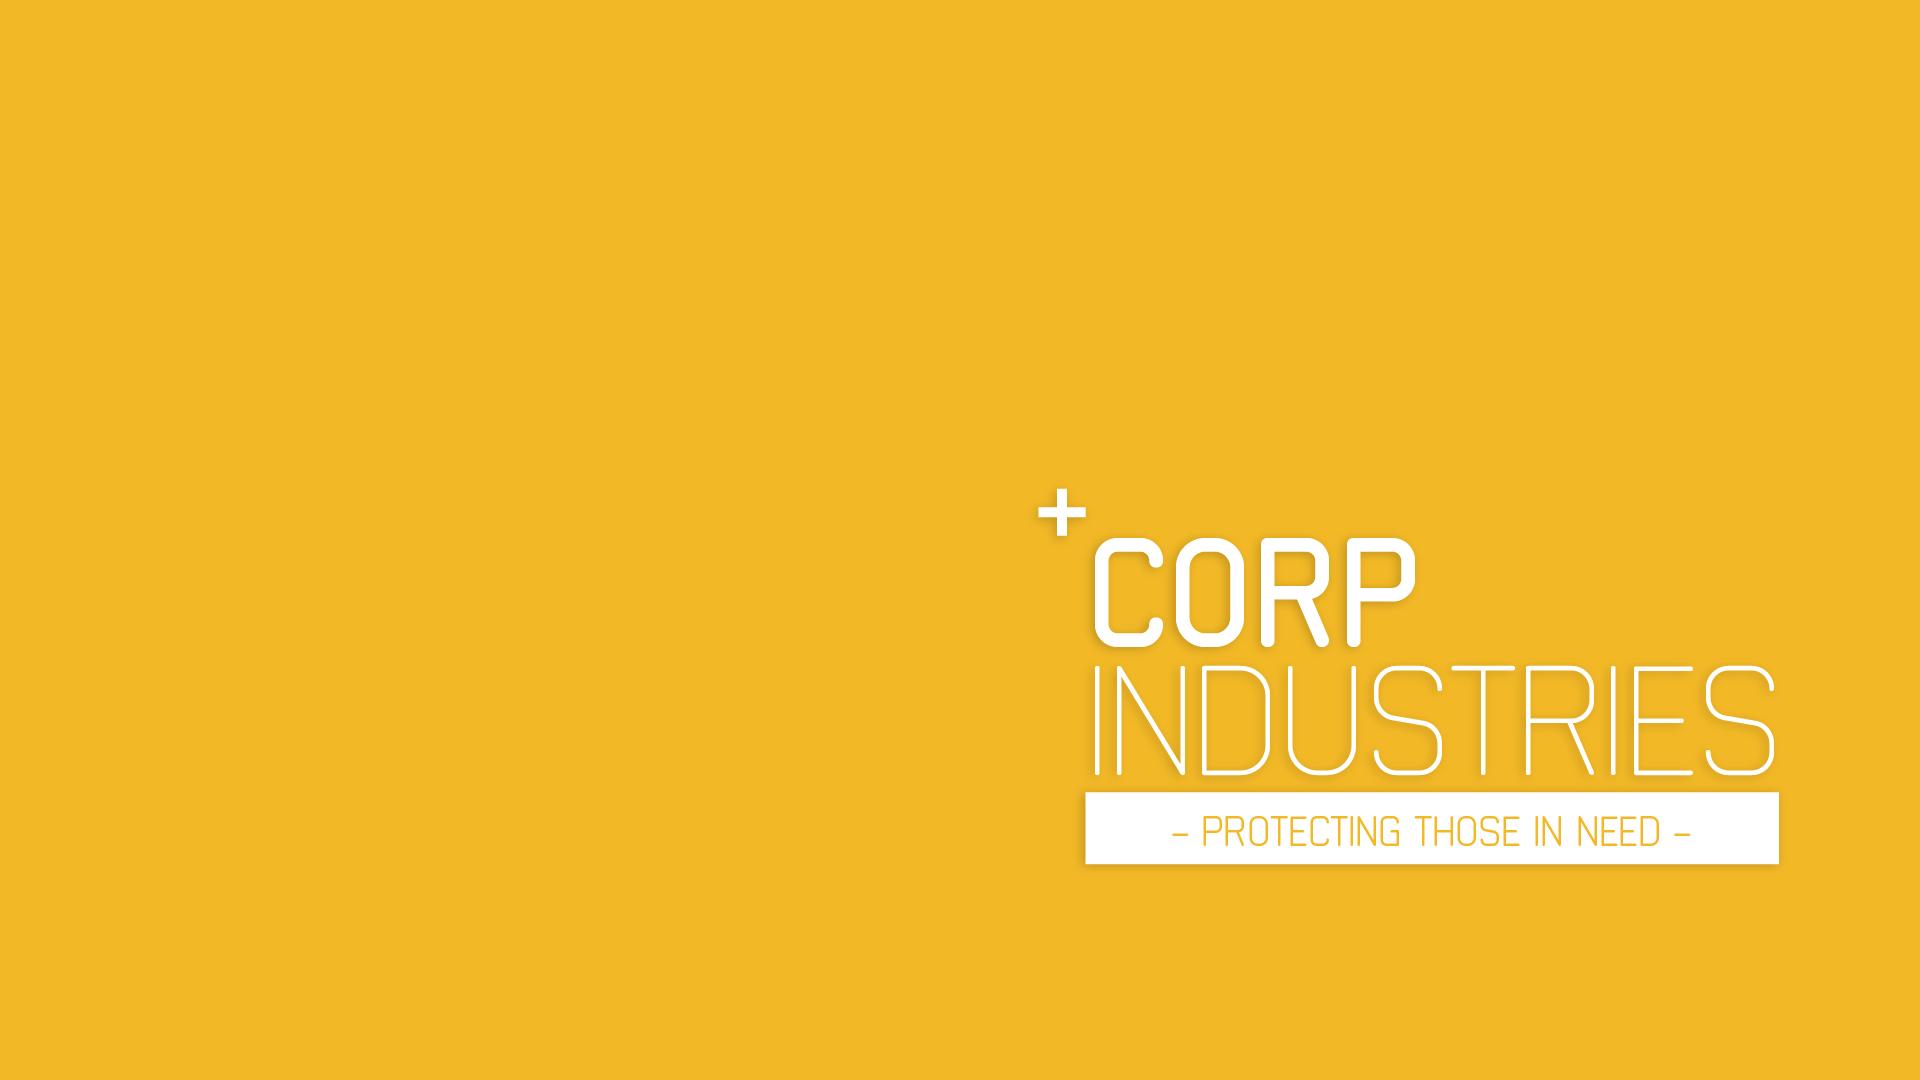 The_corporation_missionbrief_c8_v02-01.png